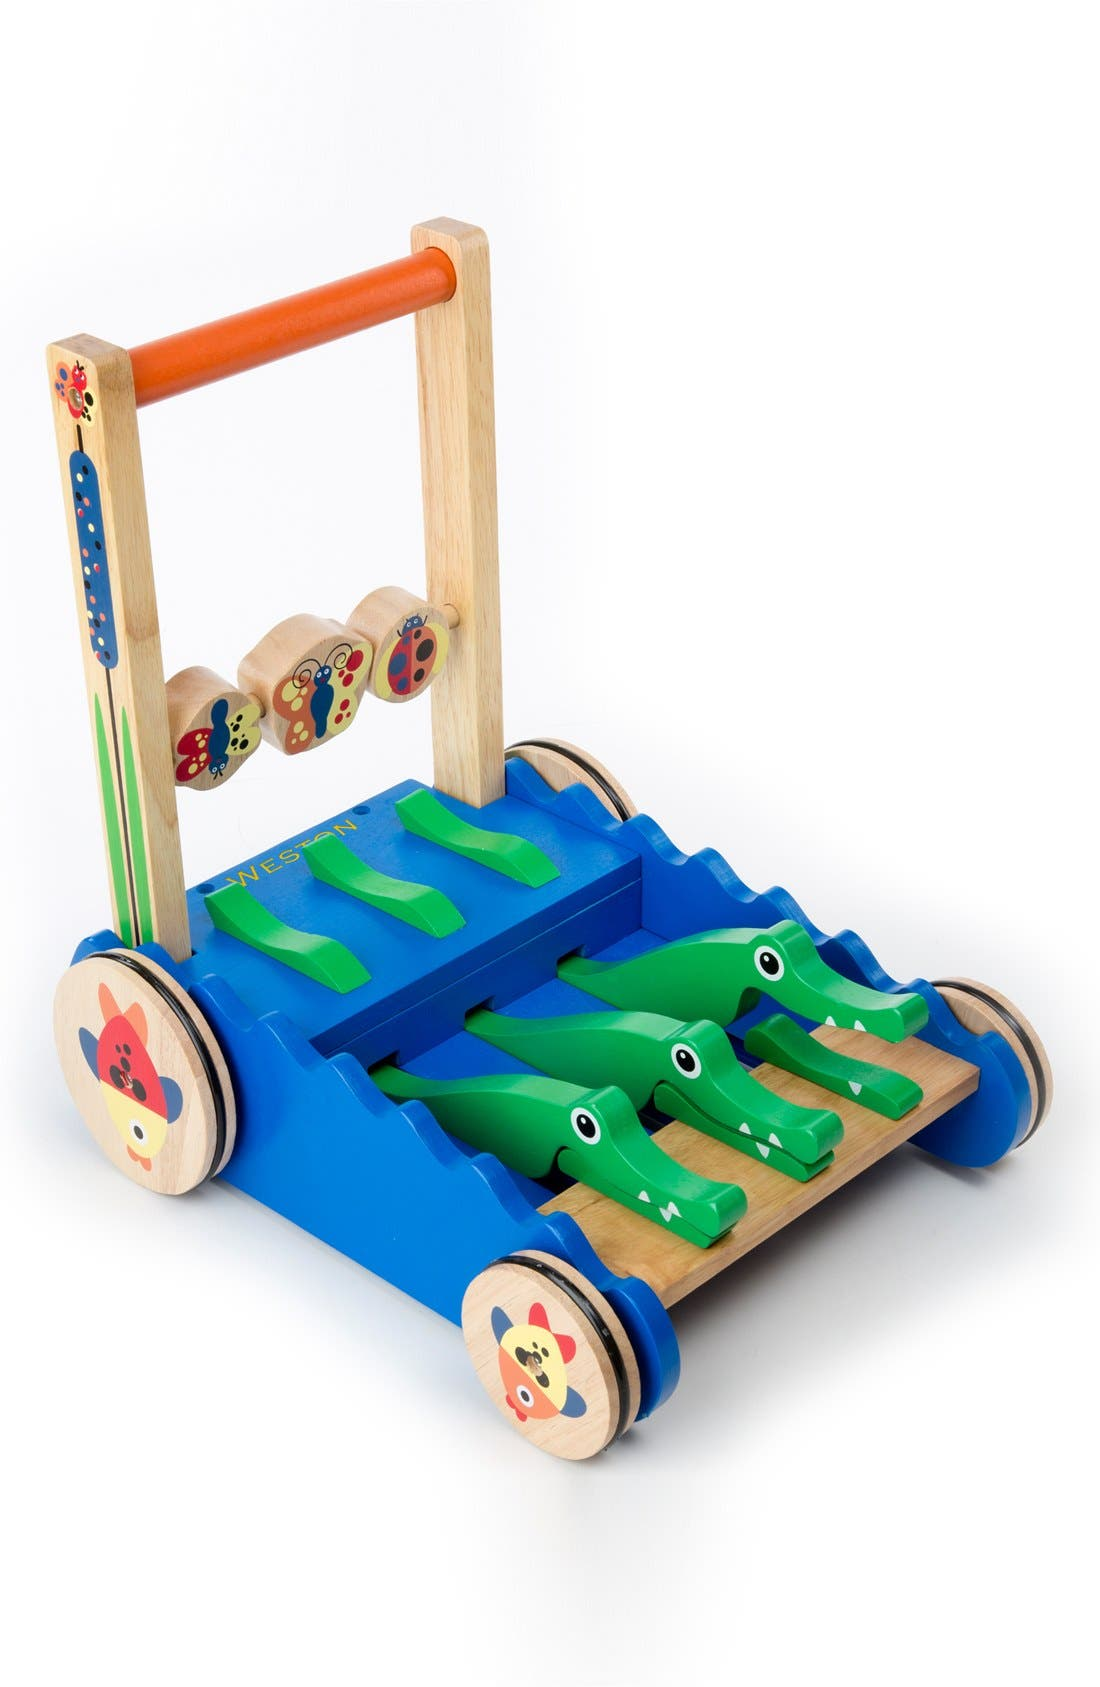 'Chomp & Clack' Personalized Alligator Push Toy,                             Main thumbnail 1, color,                             BLUE